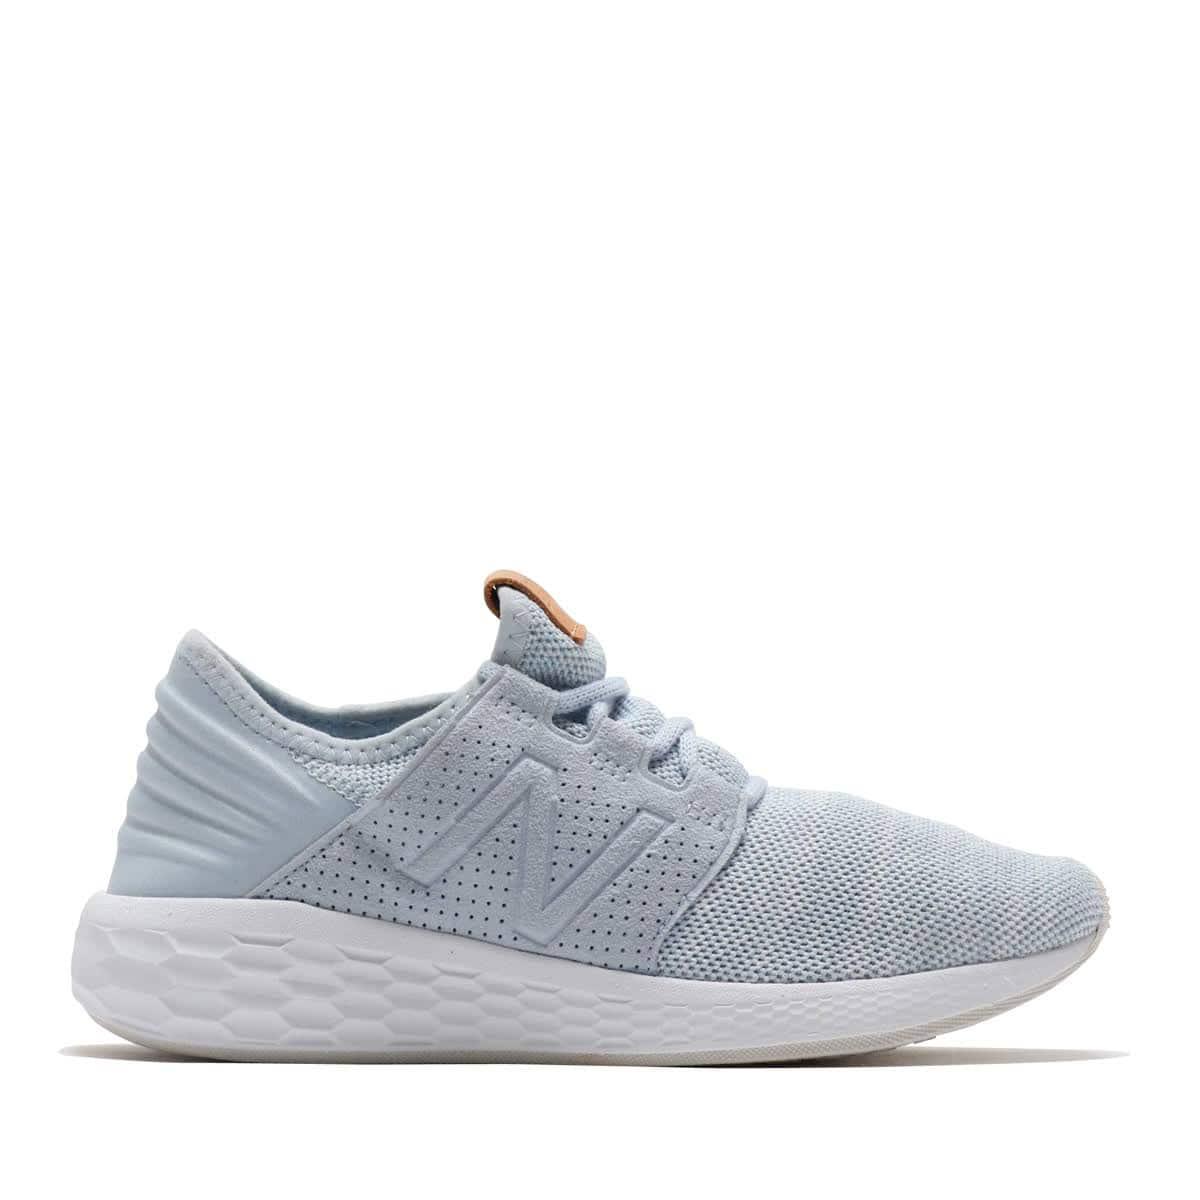 New Balance Women Fresh Foam Cruz V2 Knit WCRUZKI2 Sneakers Ice Blue//White